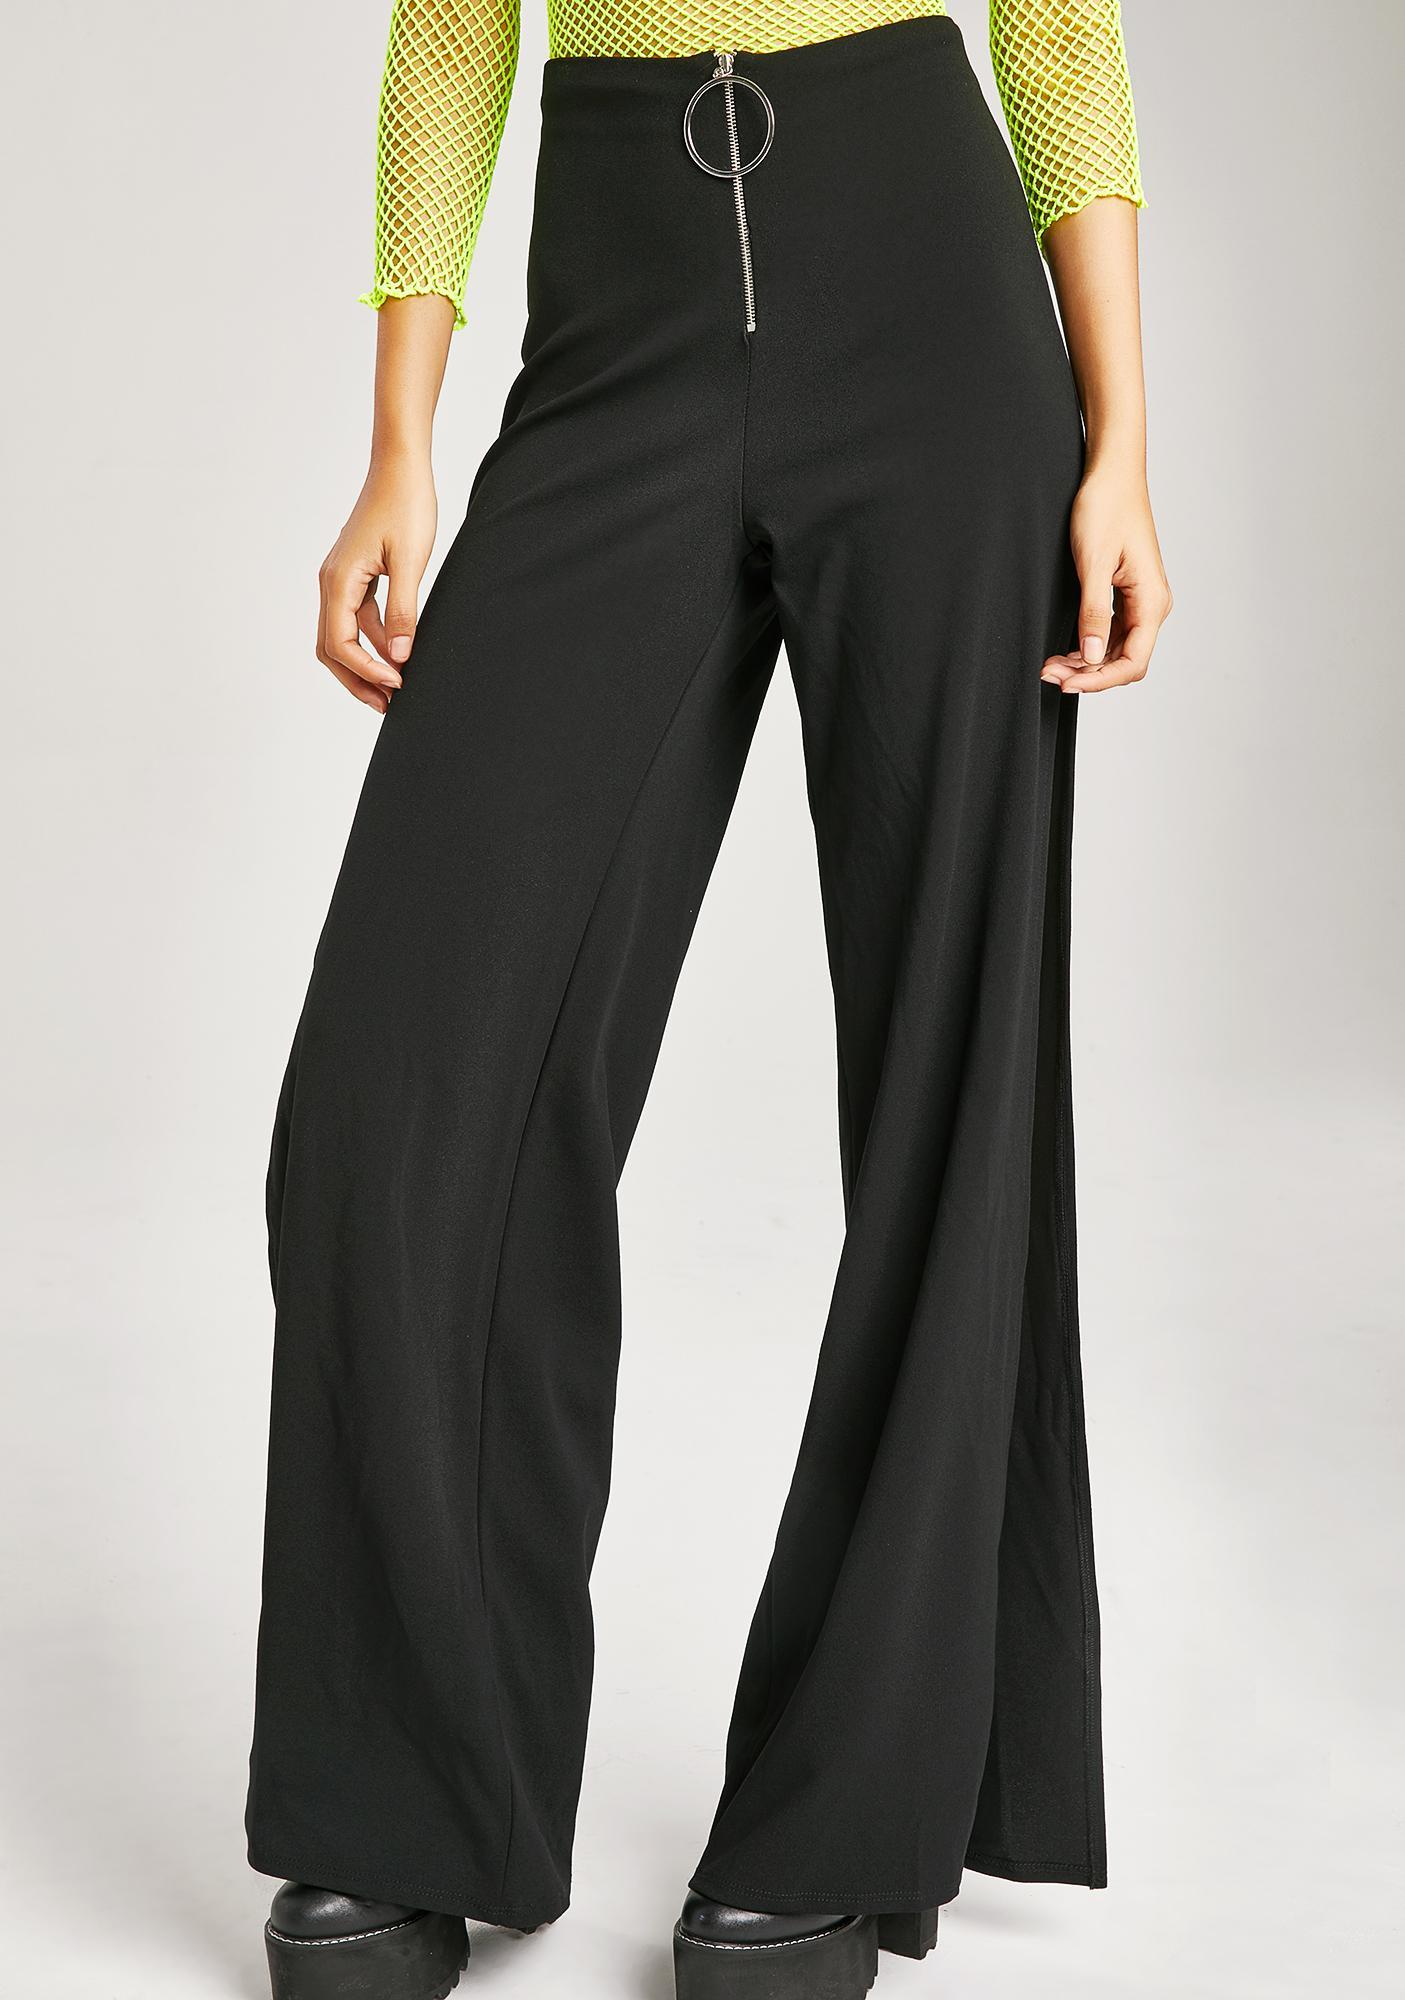 Lickety Split O-Ring Pants